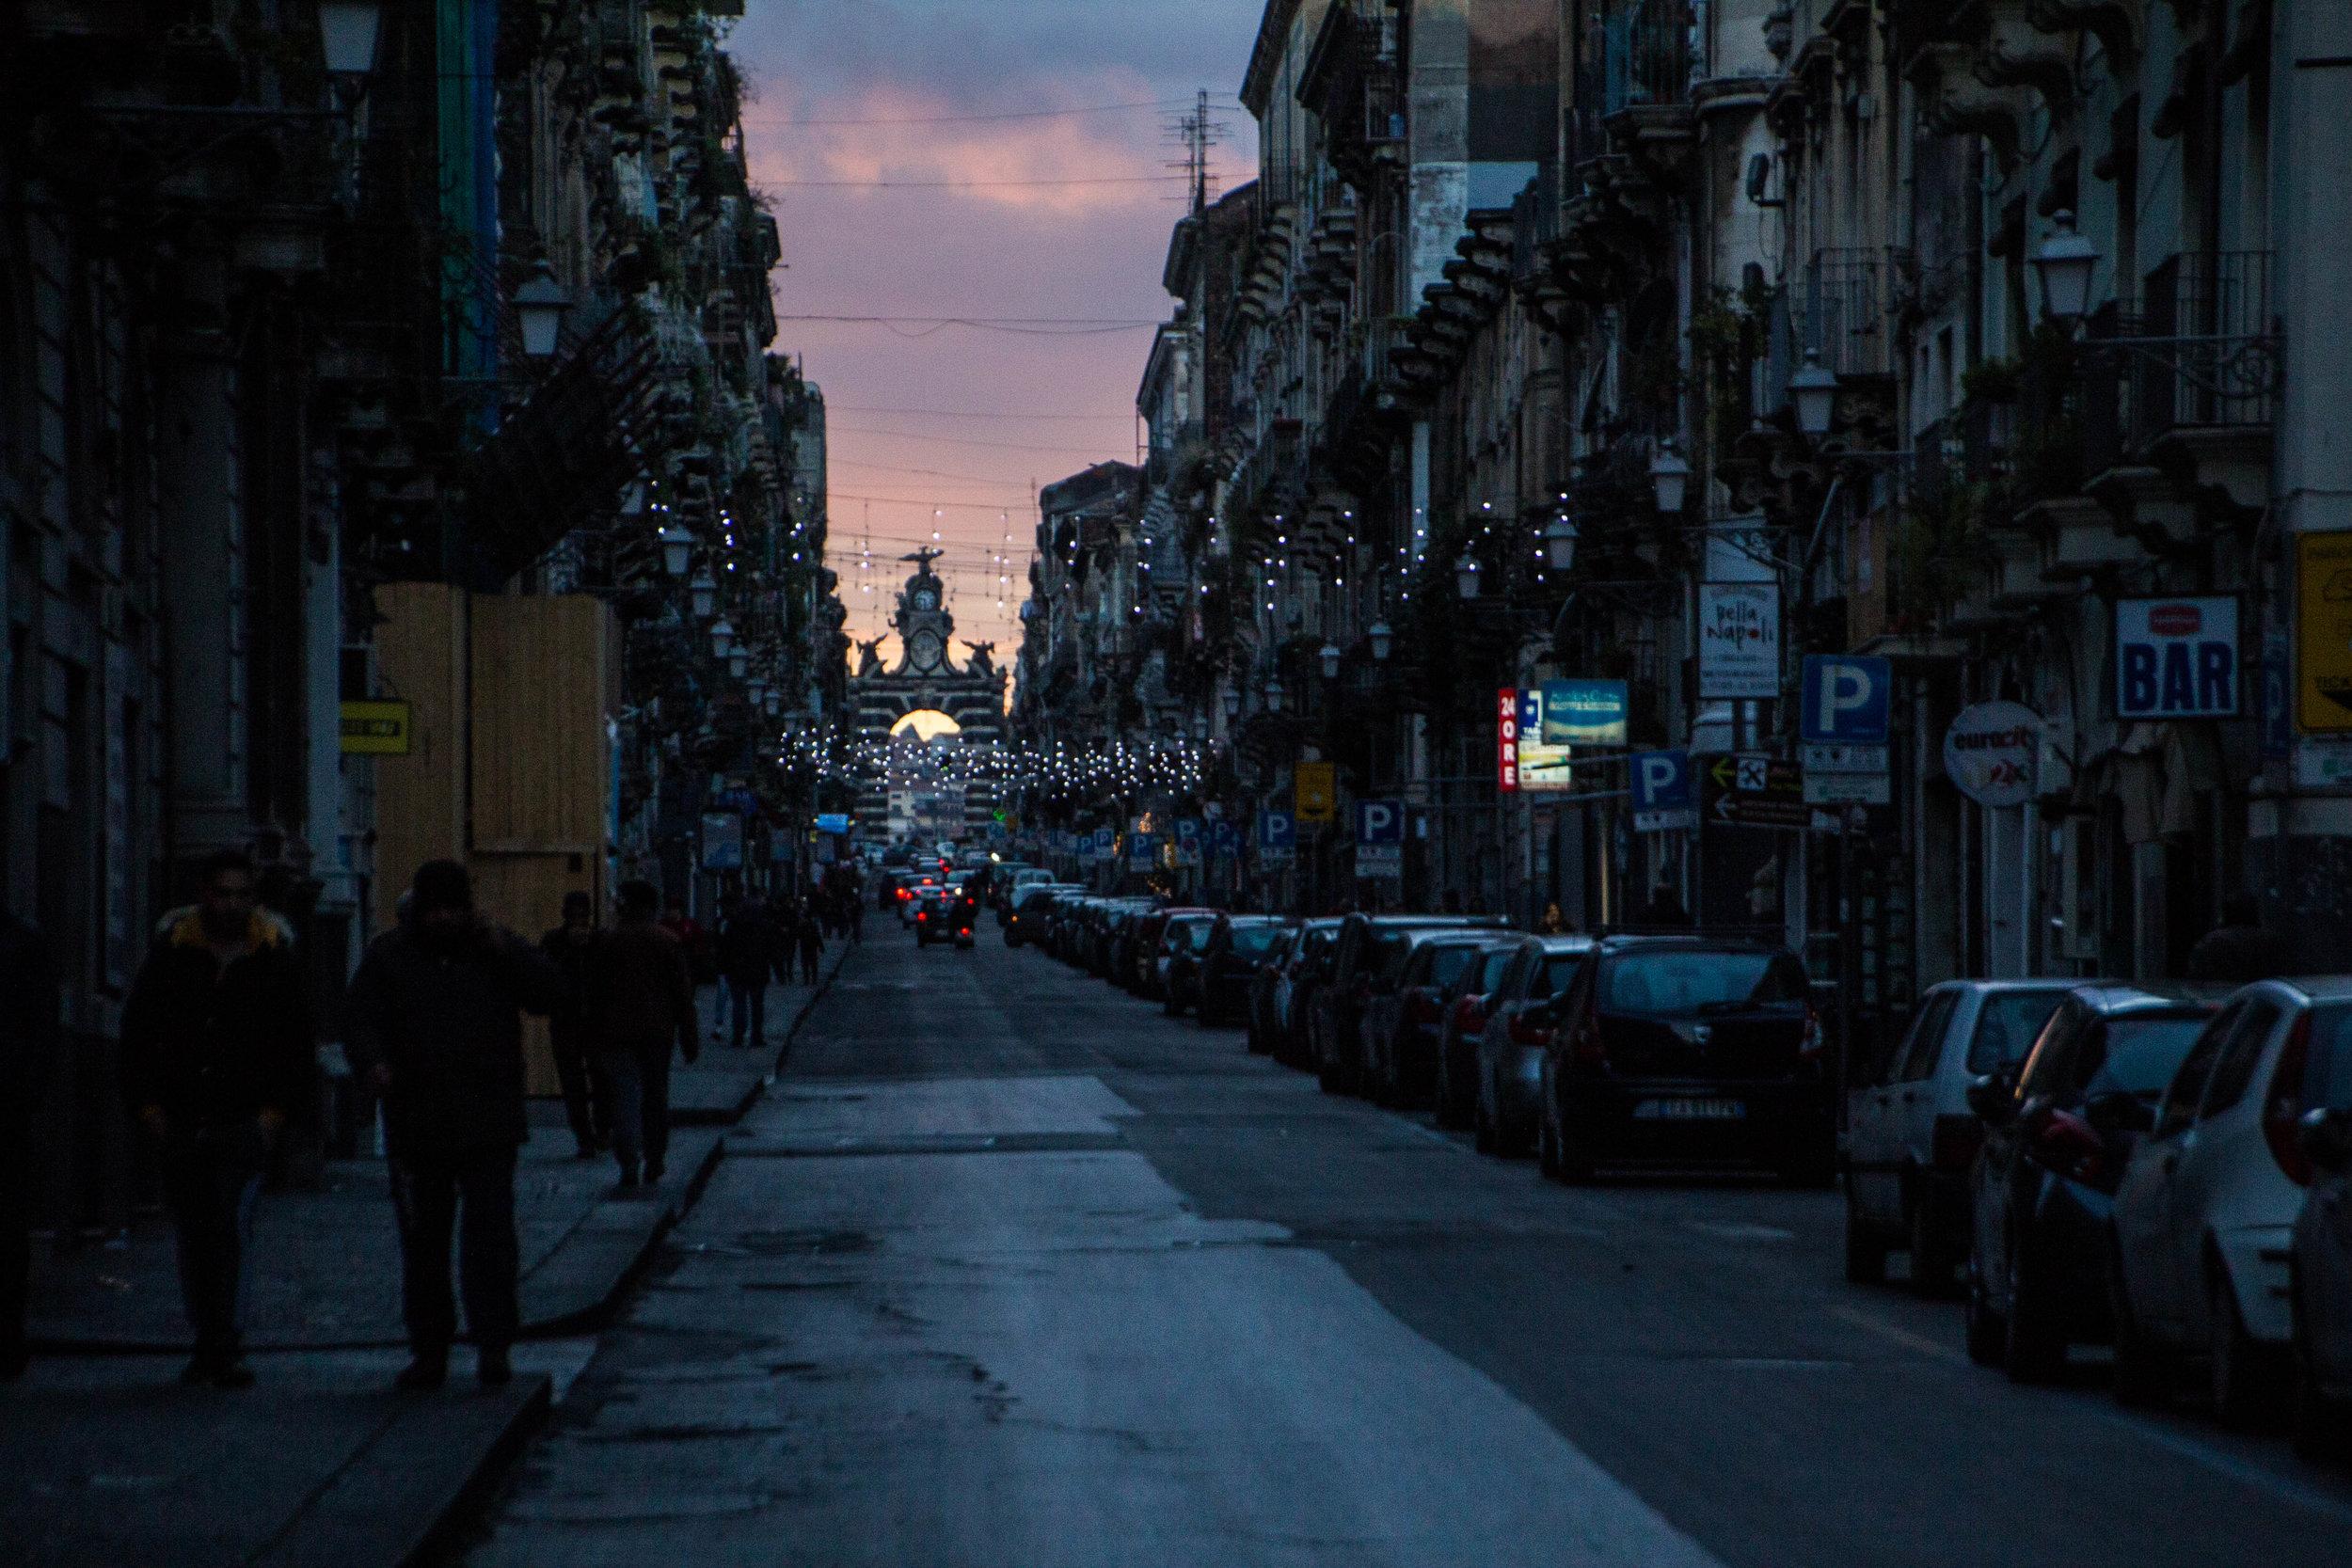 streets-catania-sicily-sicilia-32.jpg